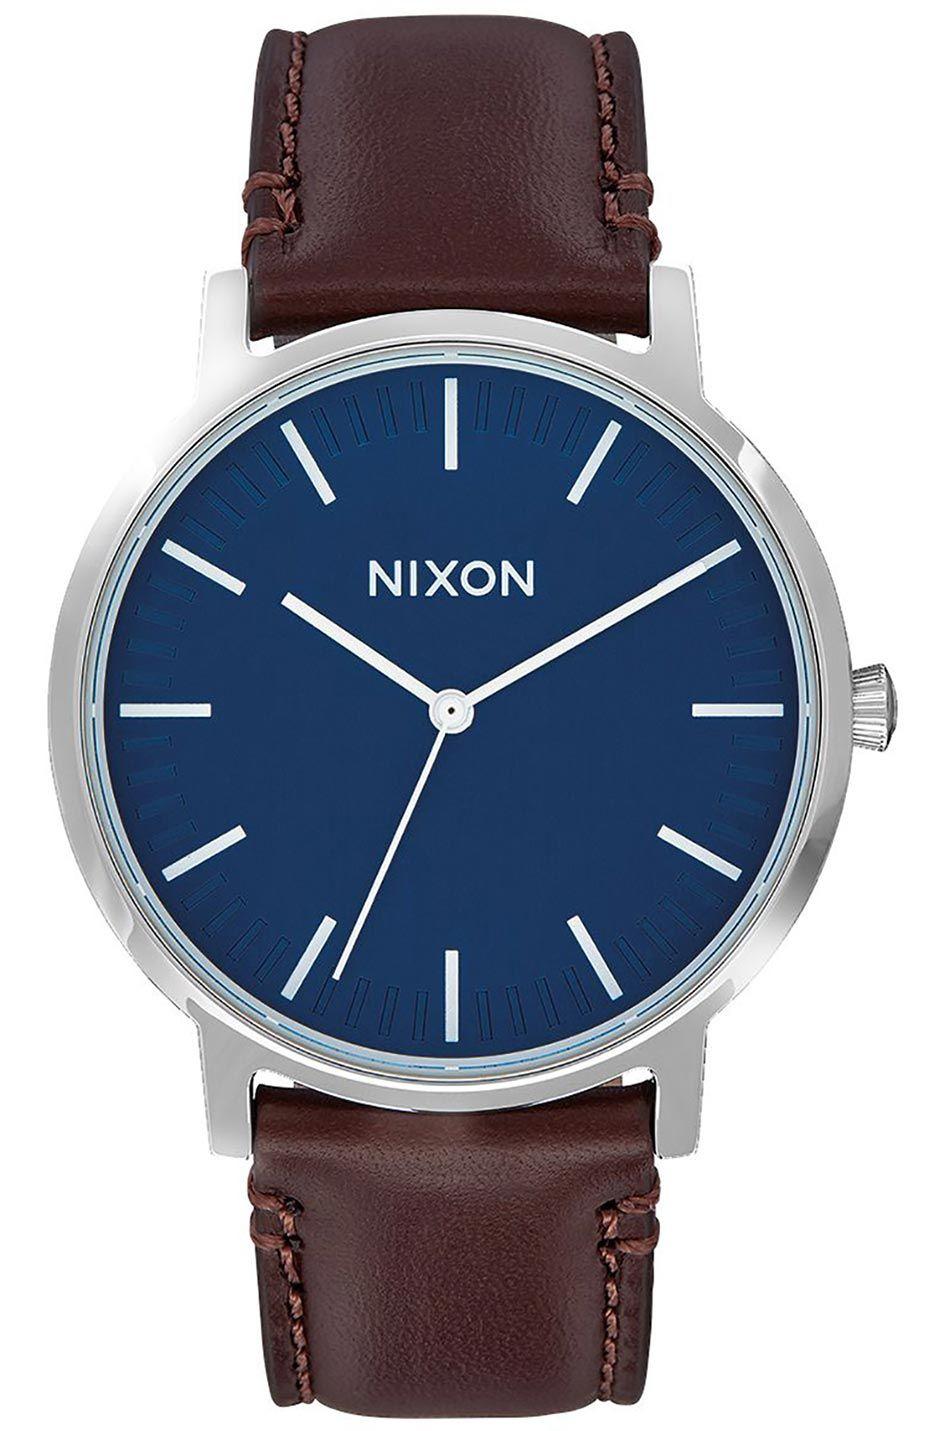 Nixon Watch PORTER LEATHER Navy/Brown